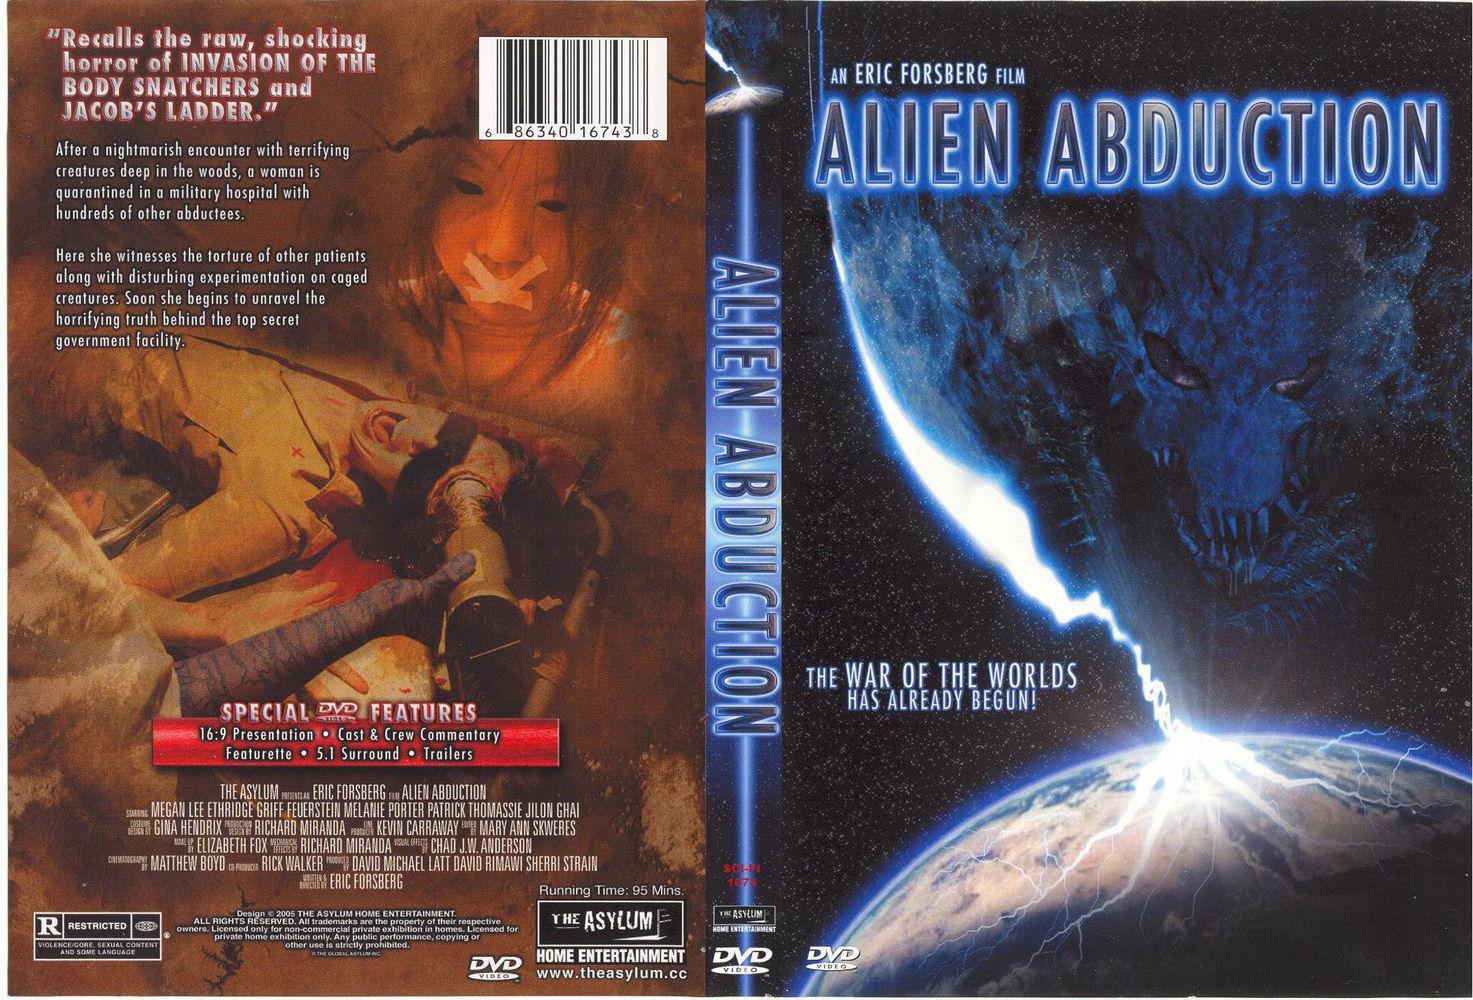 alien abduction movie - photo #21